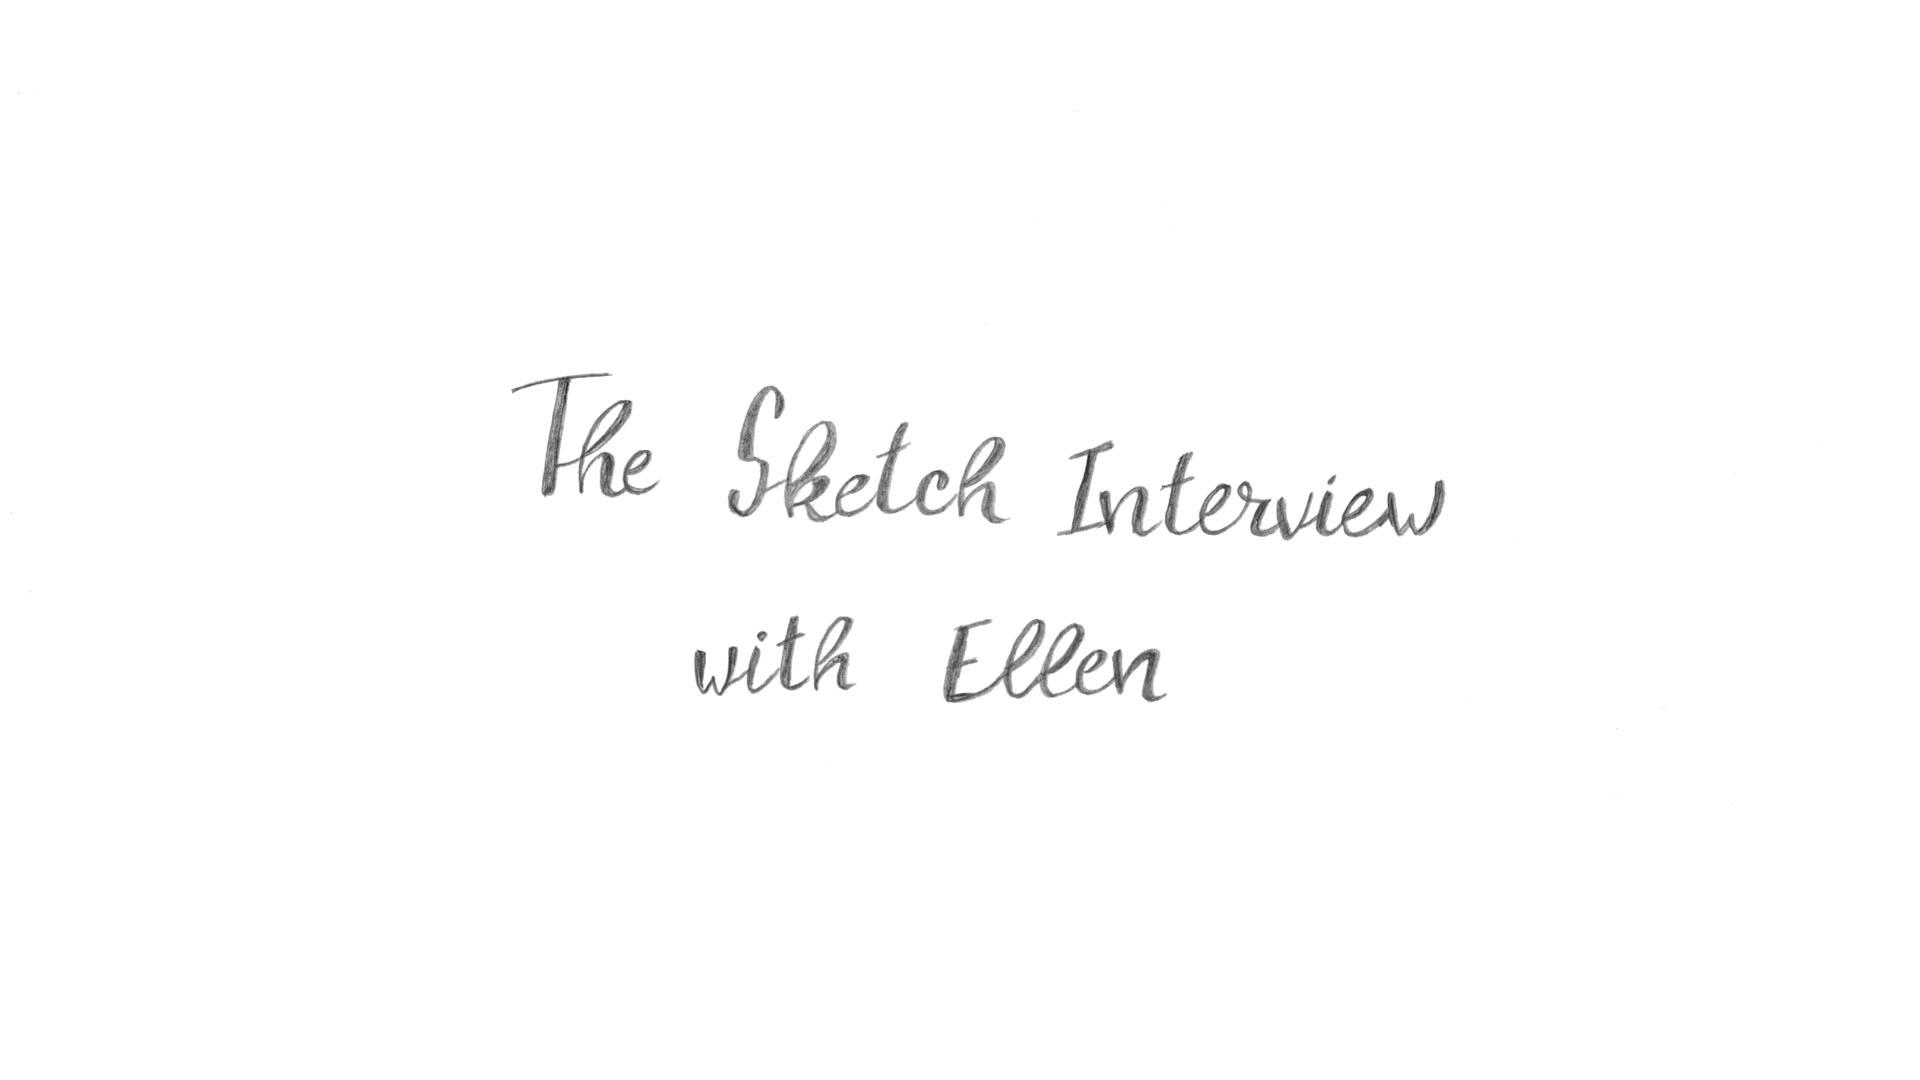 the sketch interview with Ellen.jpg